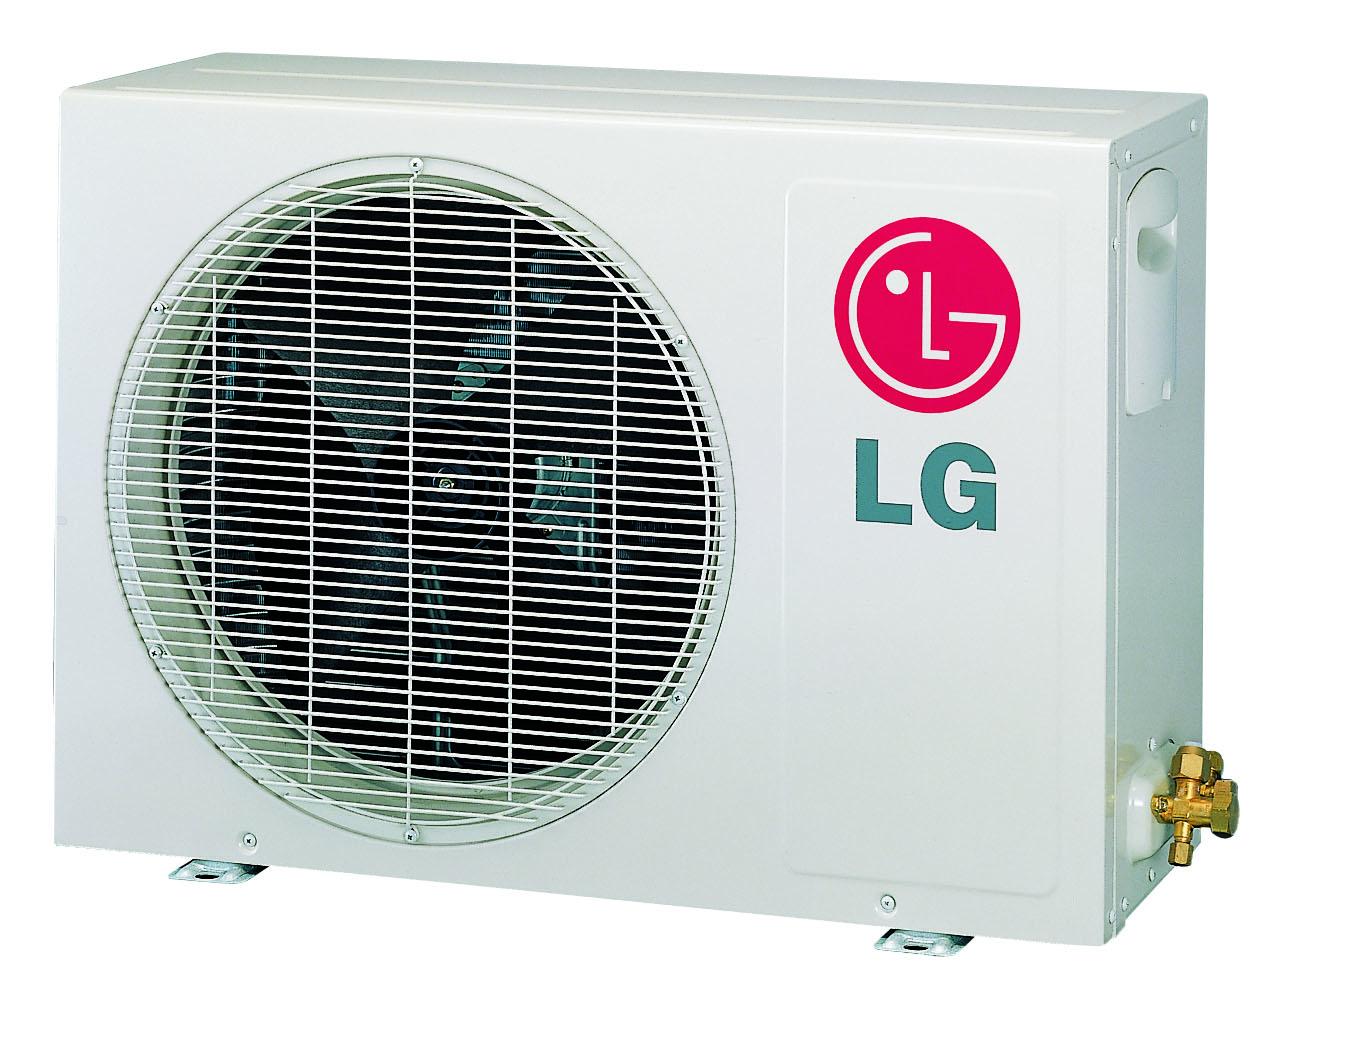 Portable Air Conditioning Fixed Air. Daikin Air Conditioner Reviews  #A62536